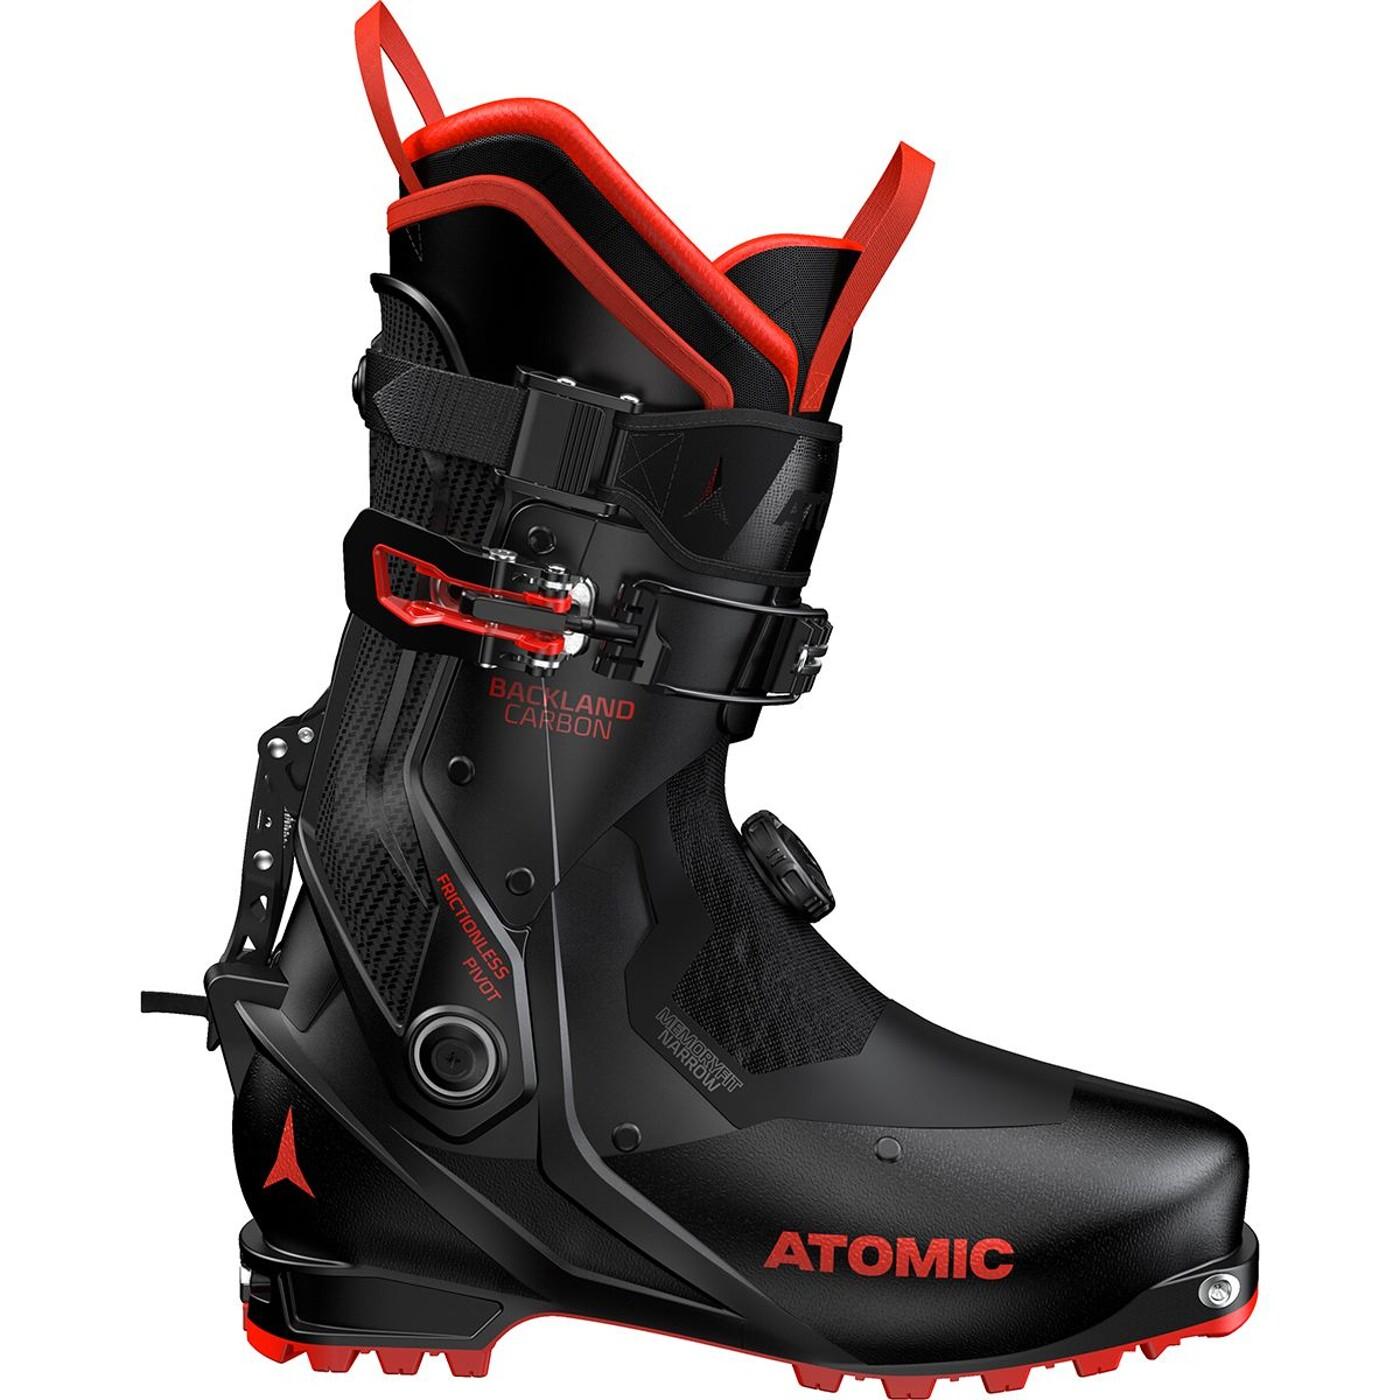 ATOMIC TOURENSCHUH BACKLAND CARBON Black/Red ATOMAC - Herren